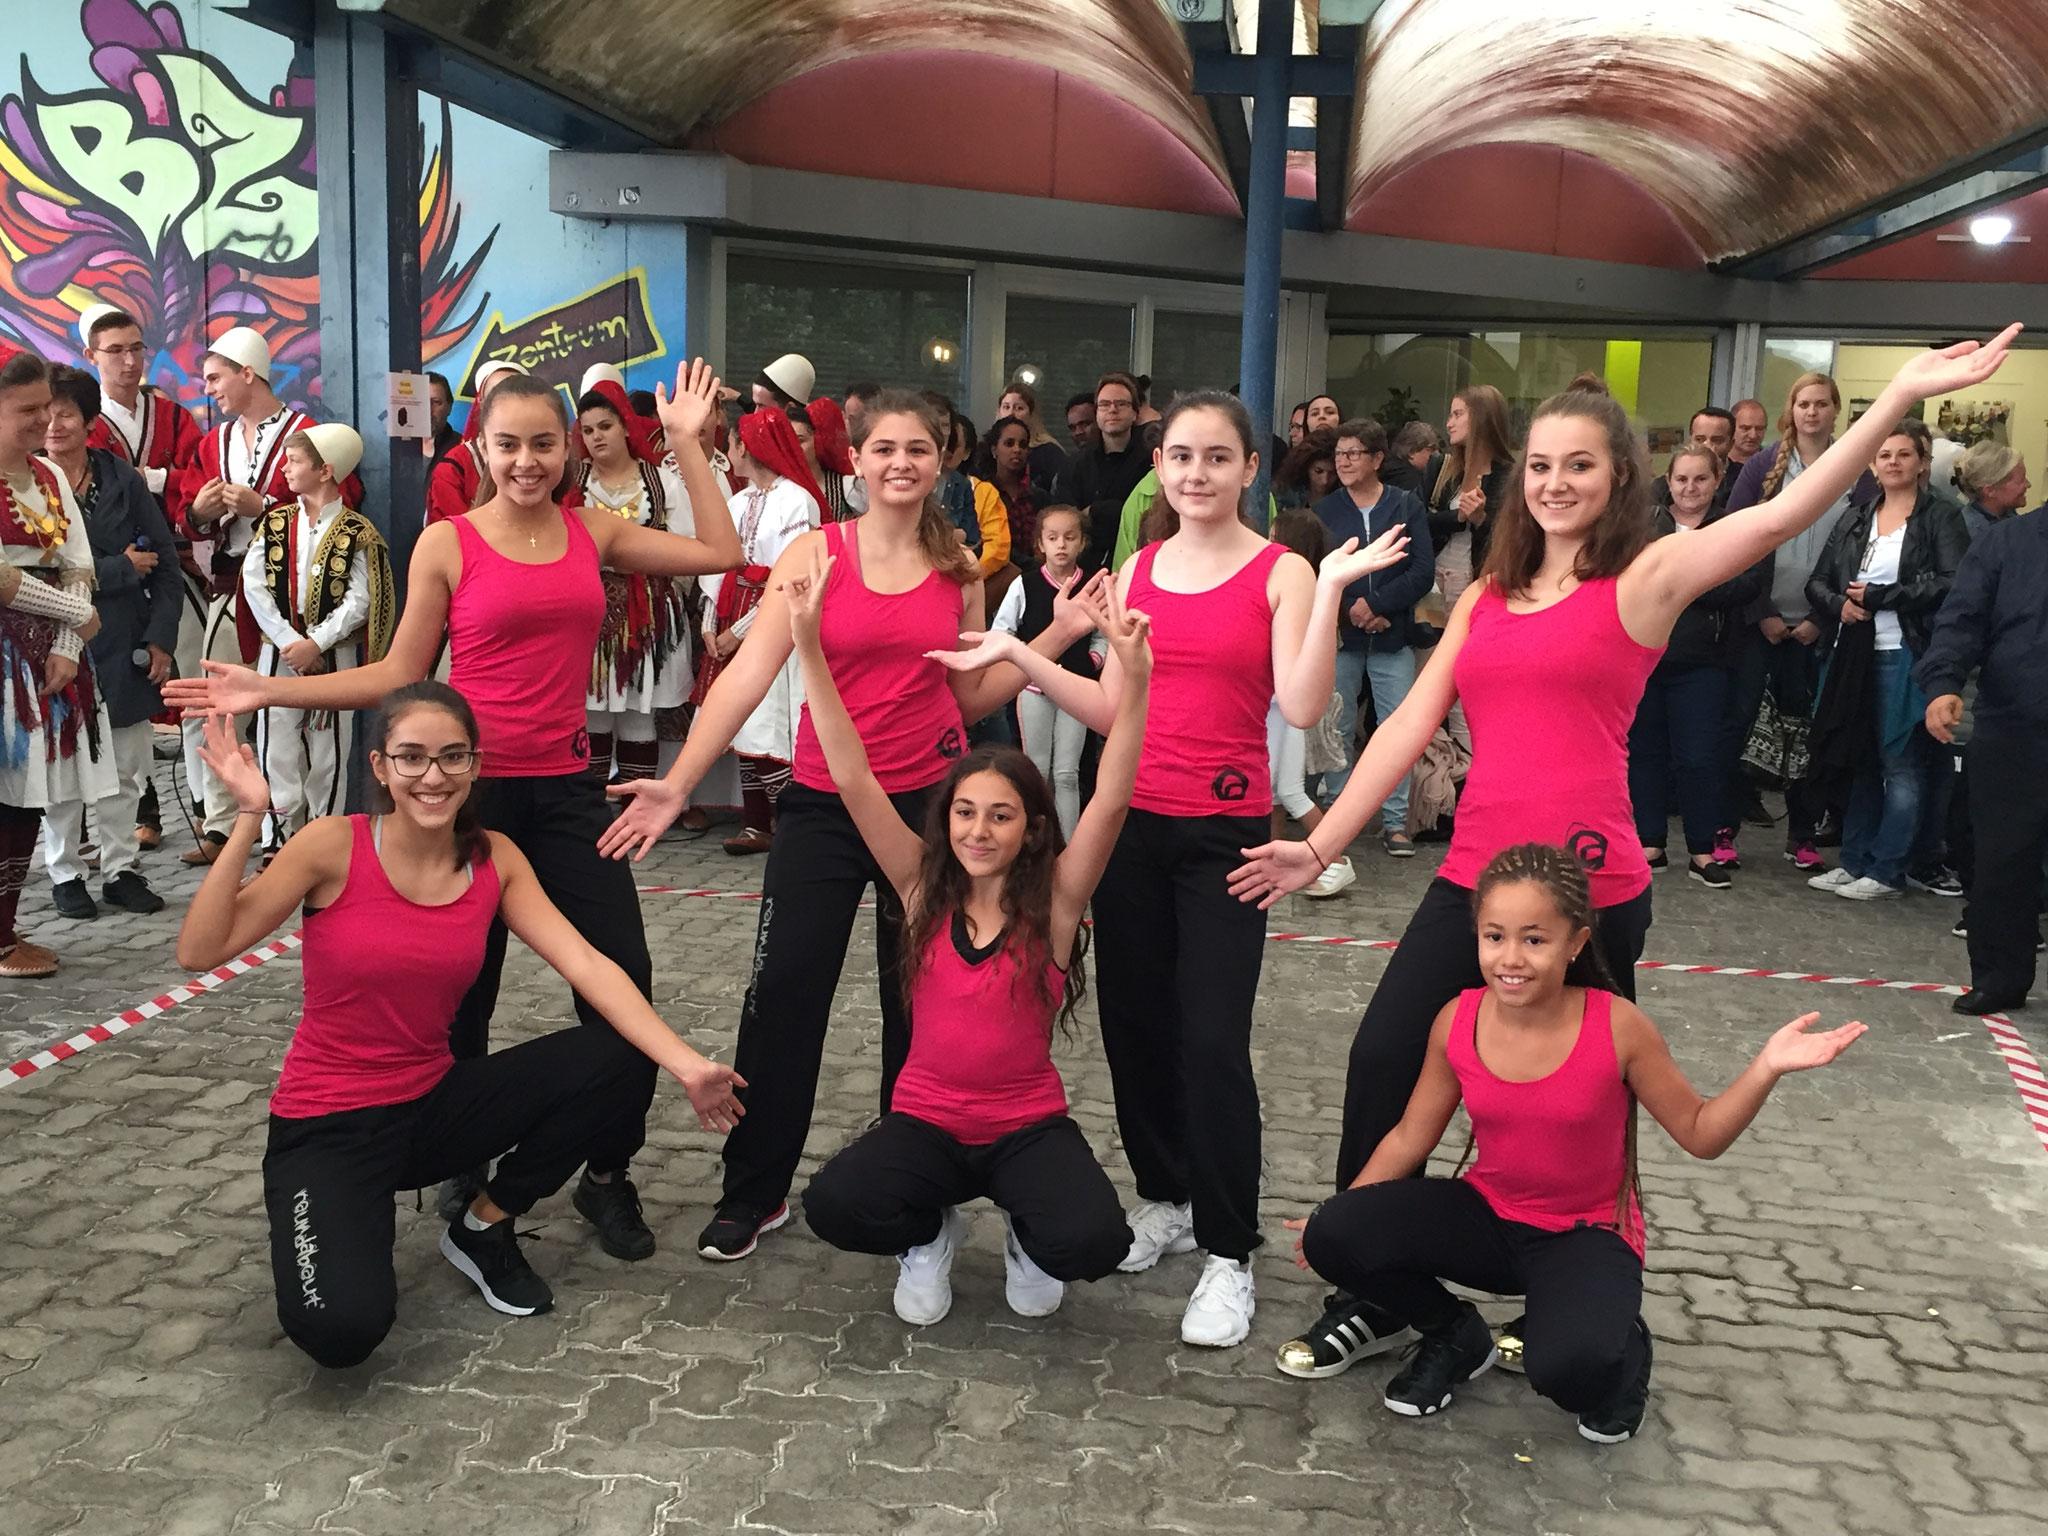 Samstag: Streetdance-Gruppe roundabout (Reformierte Kirche Regensdorf)